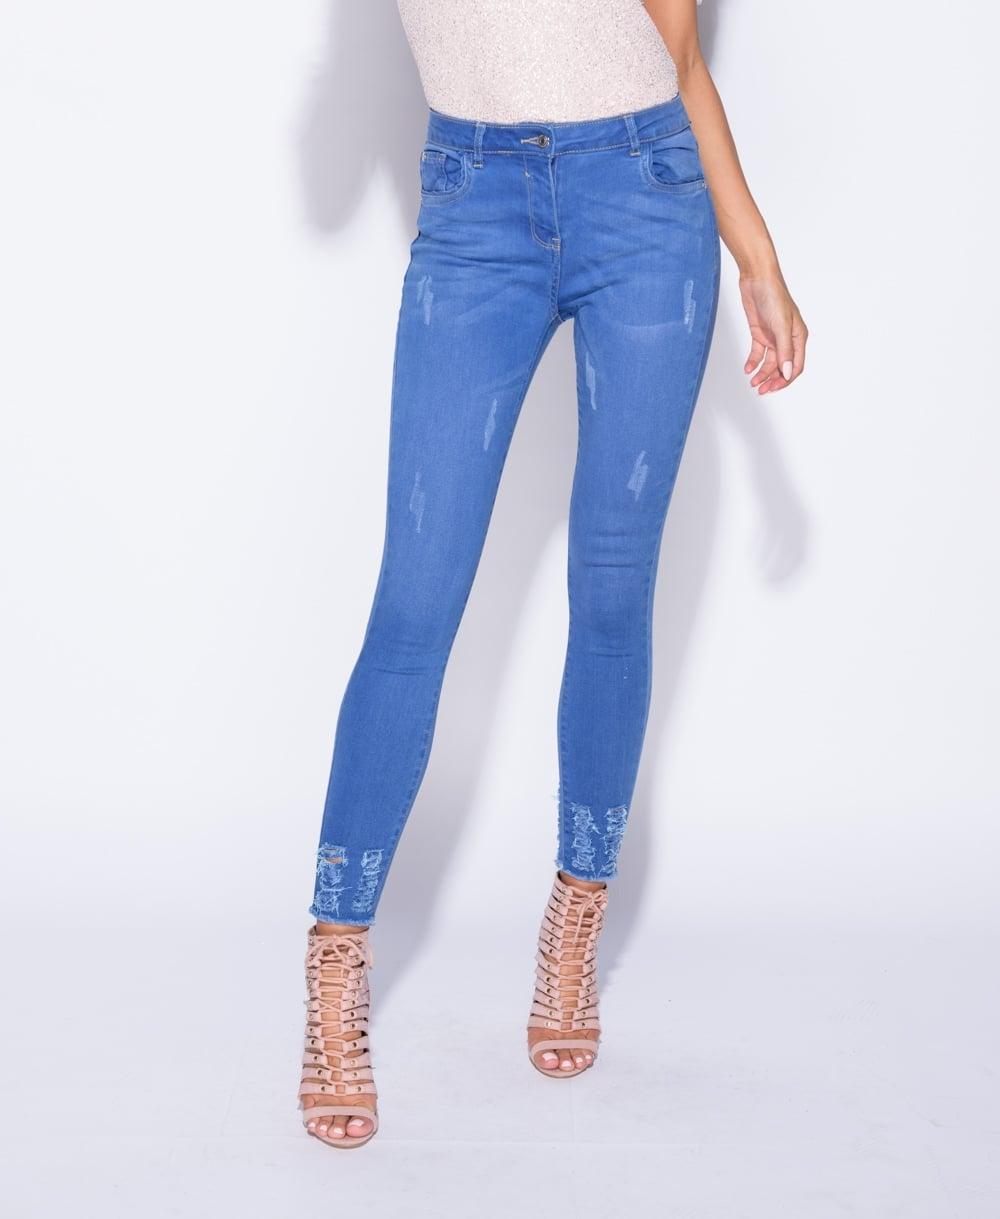 Freyed Hem Jeans